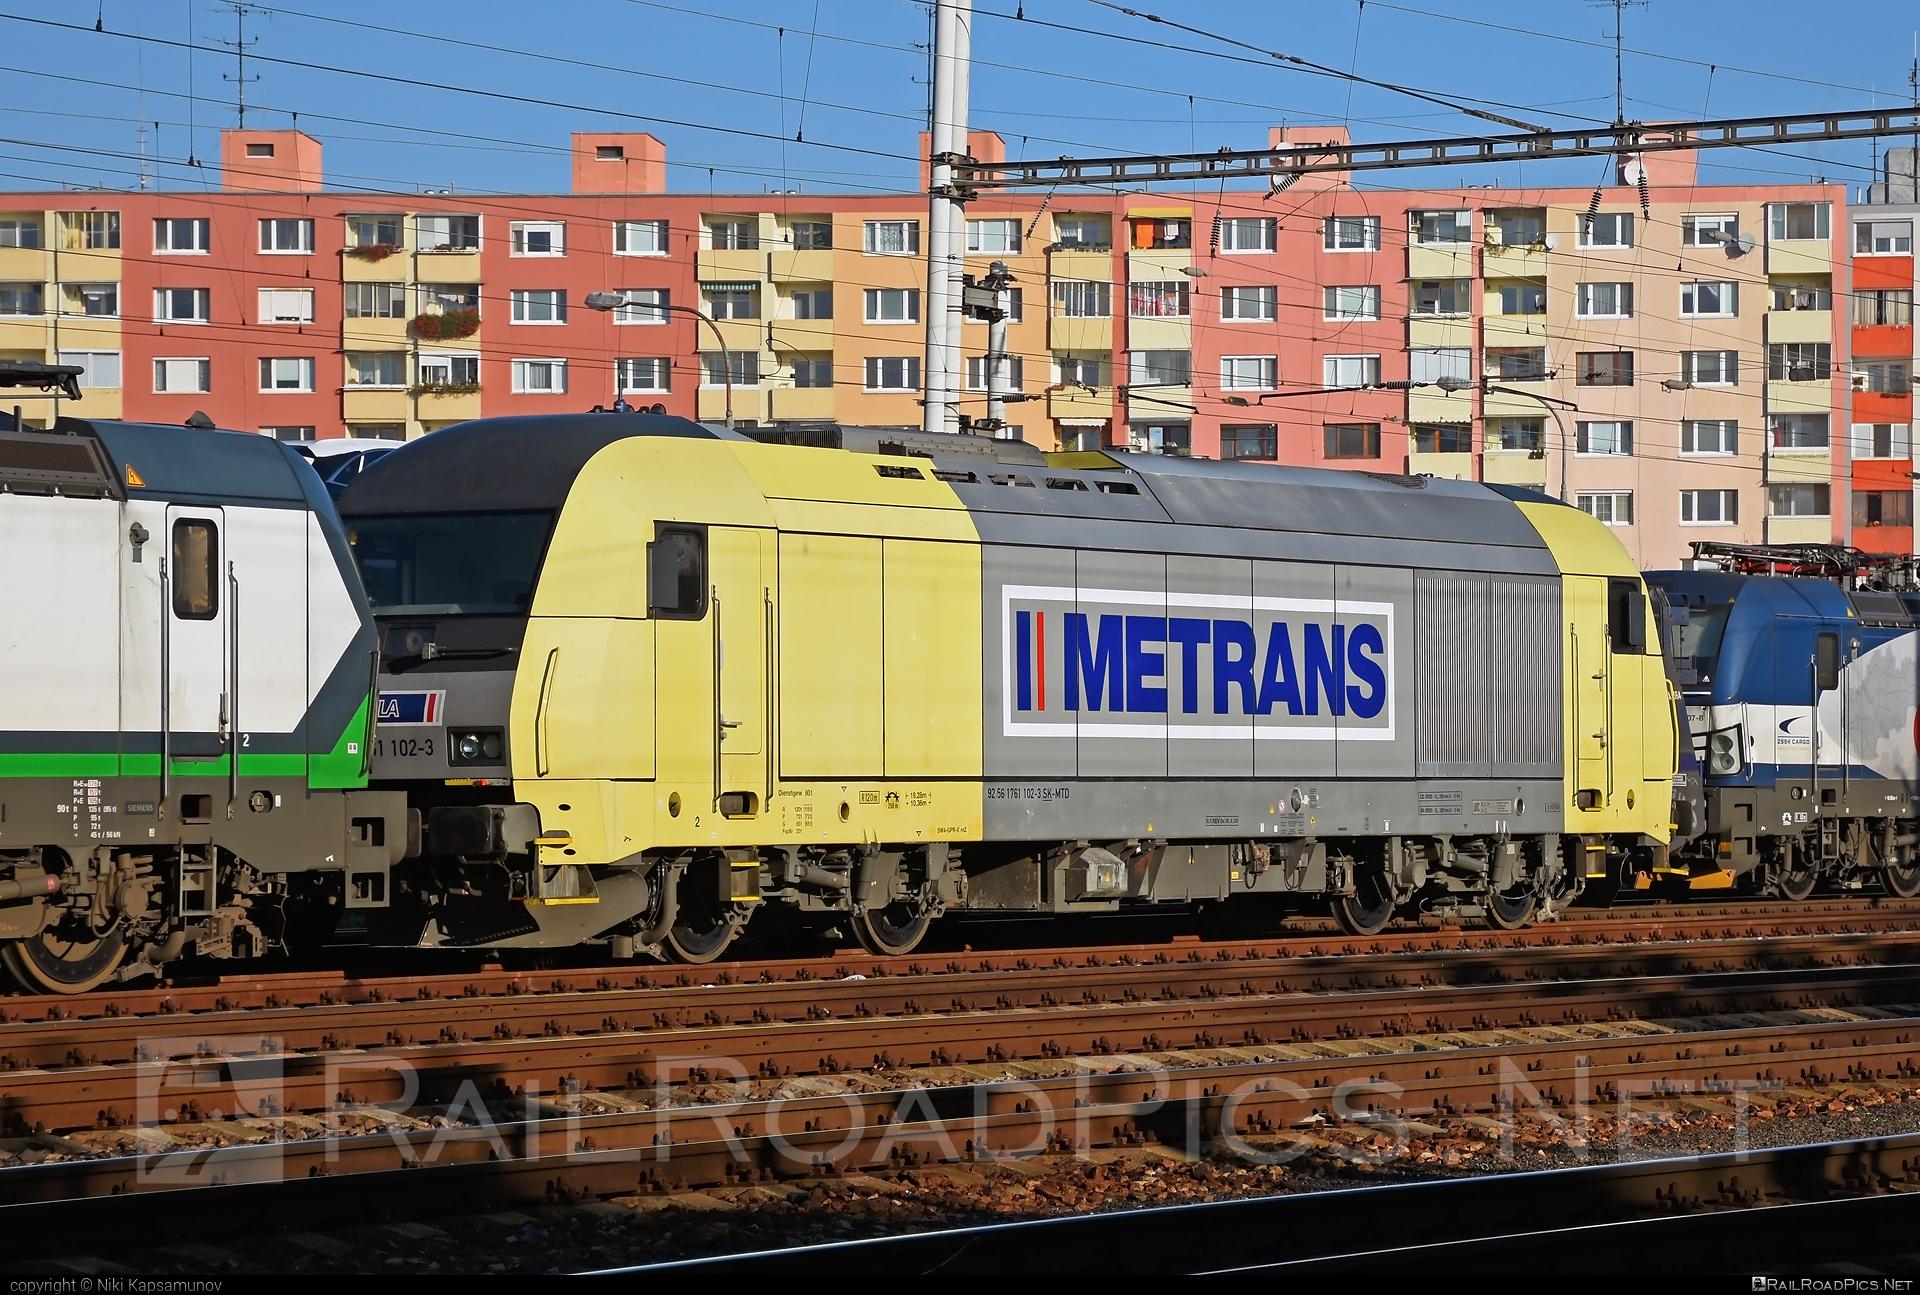 Siemens ER20 - 761 102-3 operated by METRANS (Danubia) a.s. #er20 #er20hercules #eurorunner #hercules #hhla #metrans #metransdanubia #siemens #siemenser20 #siemenser20hercules #siemenseurorunner #siemenshercules